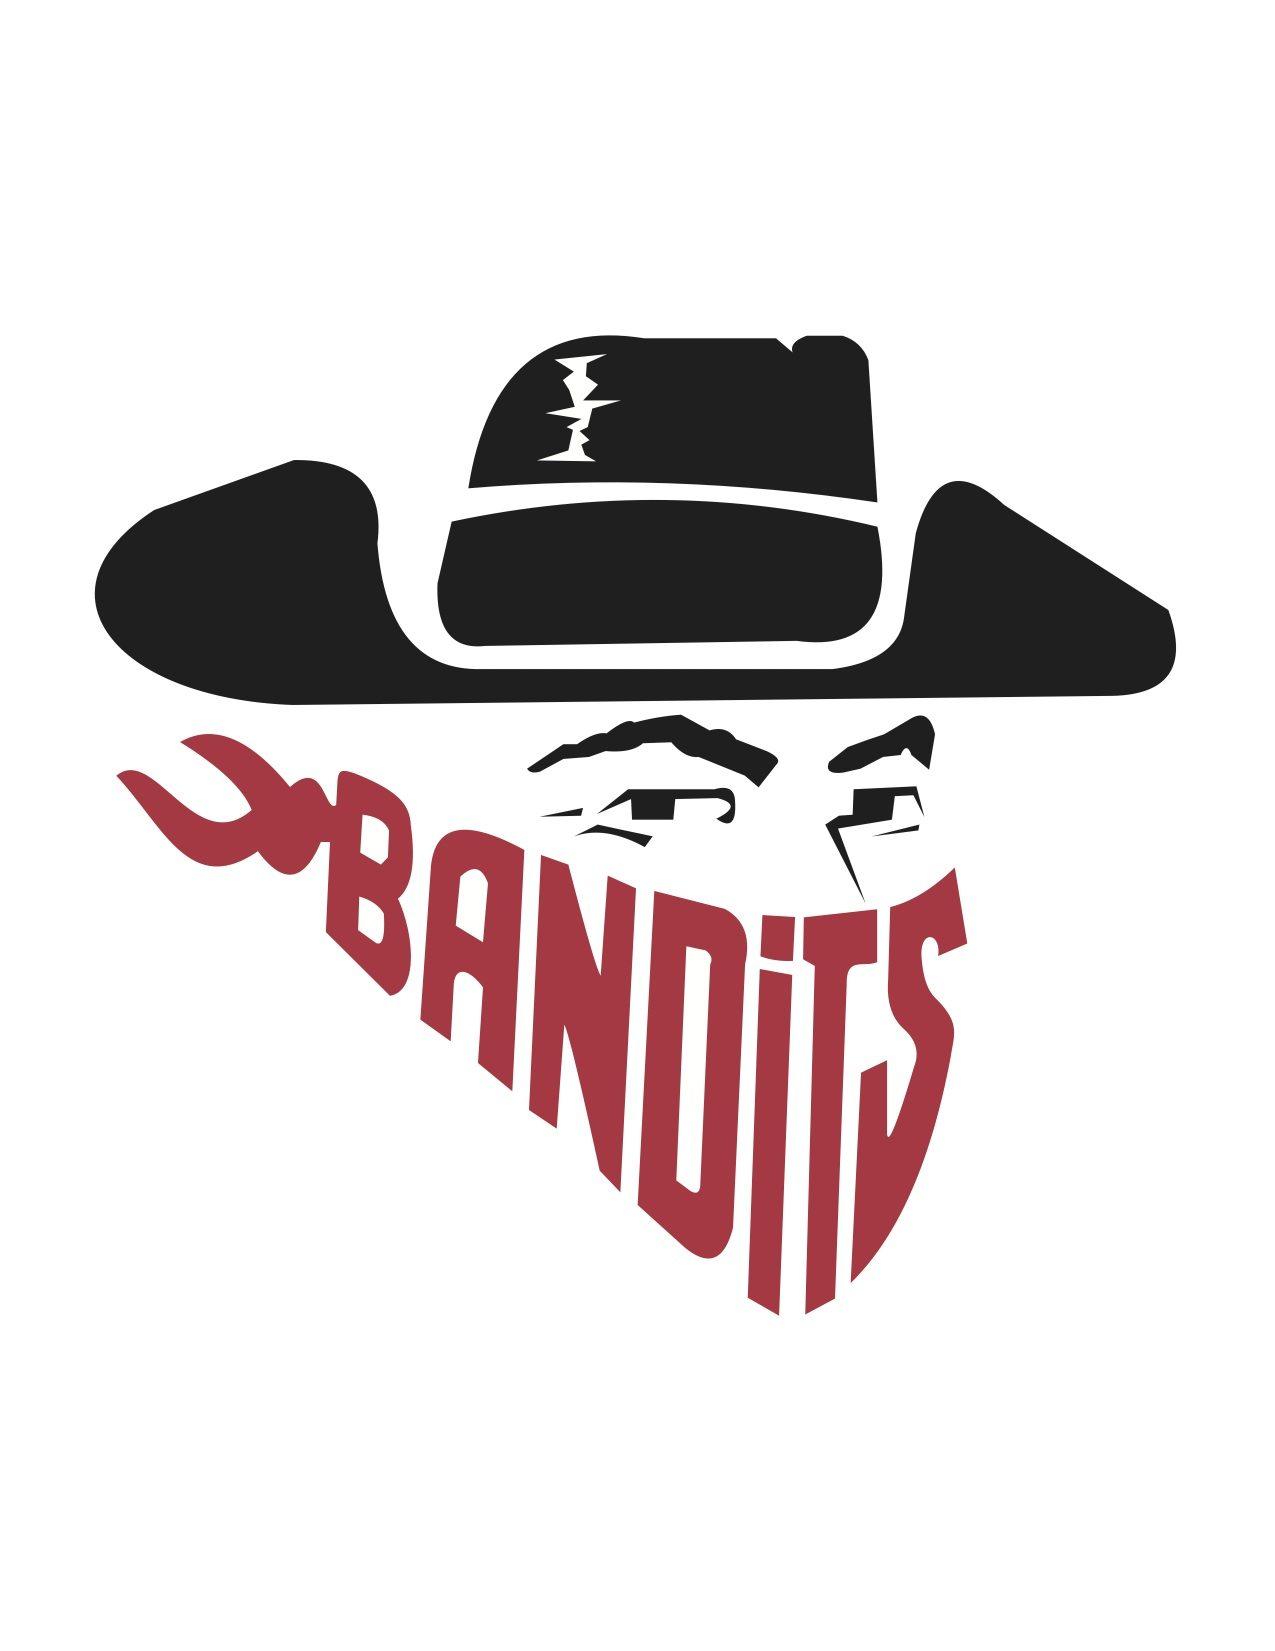 The Bandits Logo photo - 1